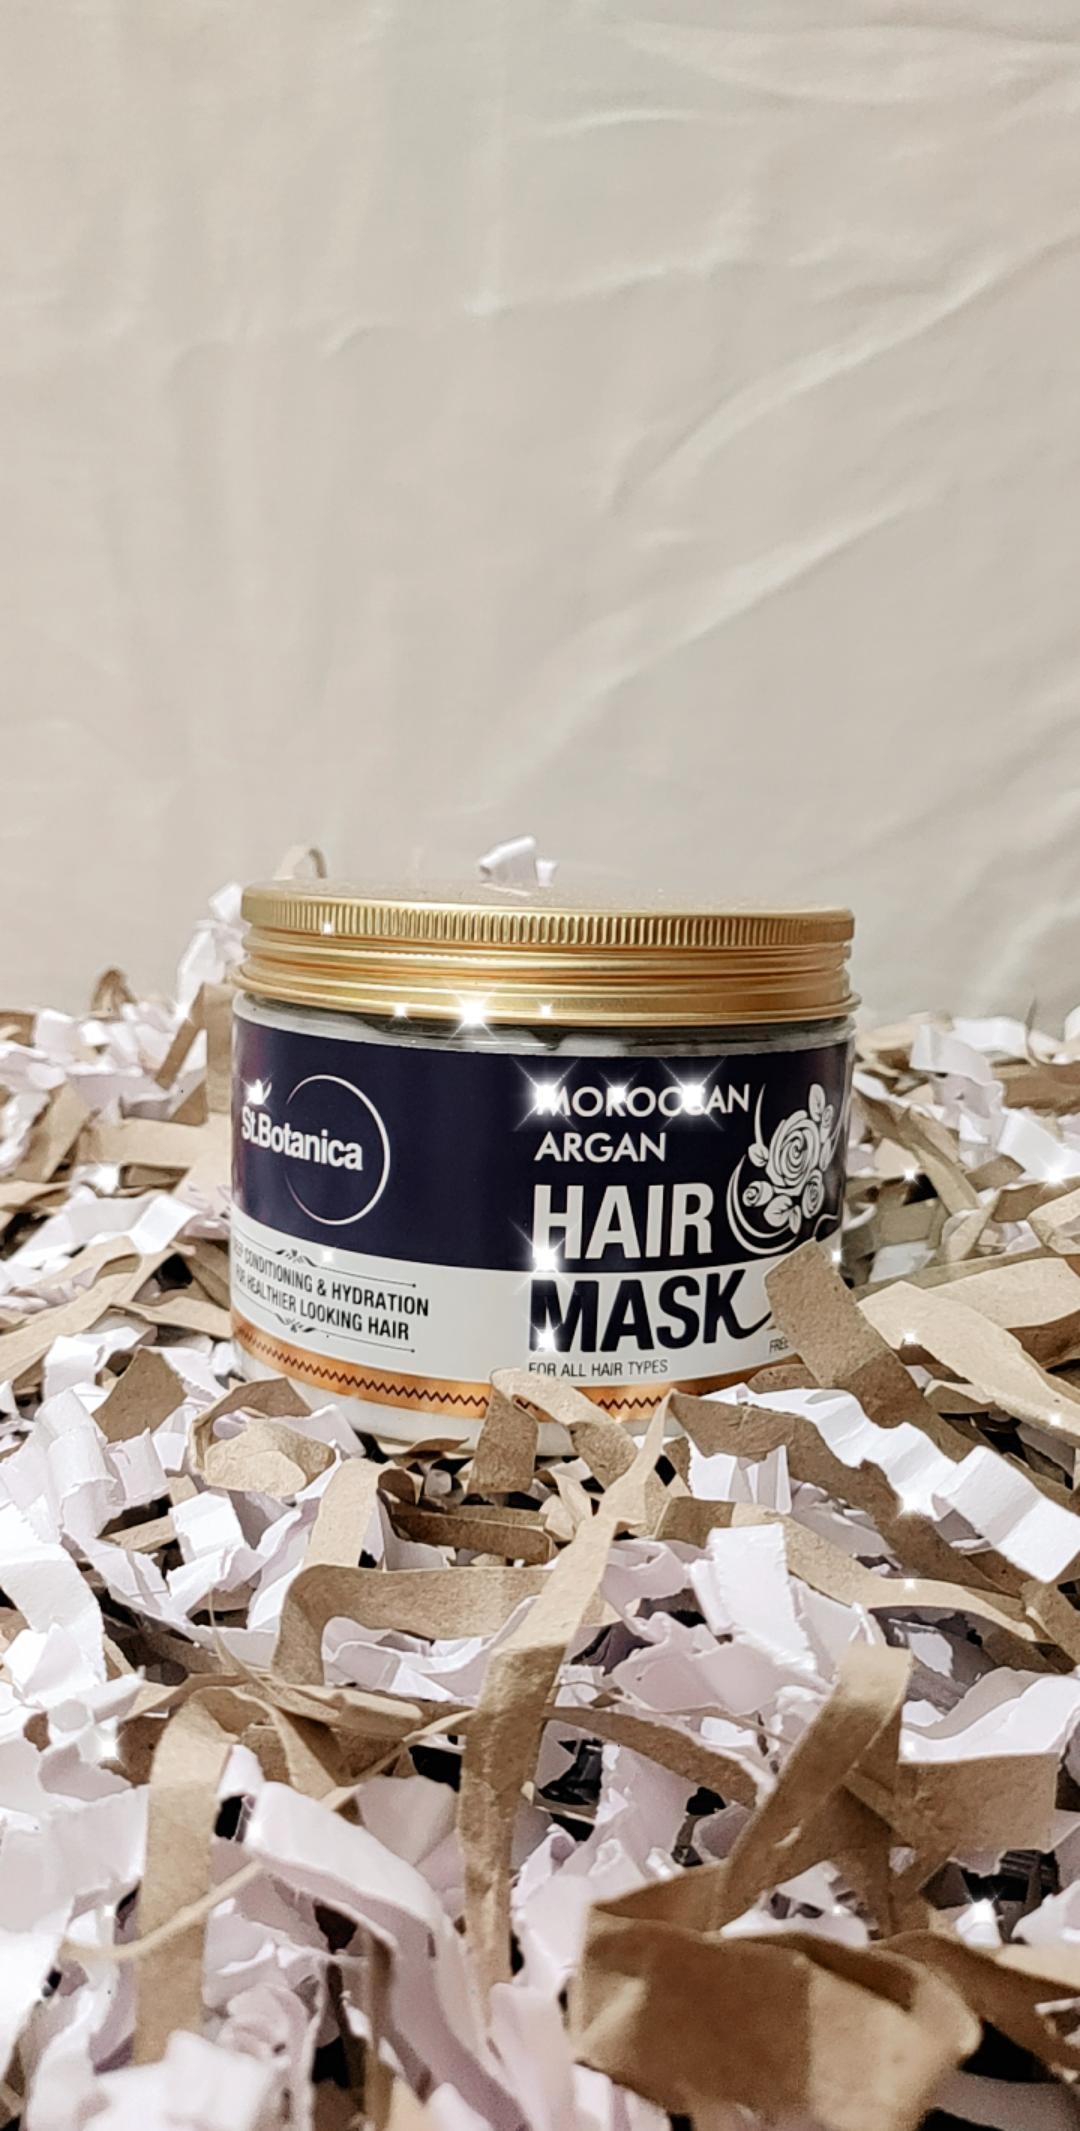 St.Botanica Moroccan Argan Hair Mask-Hair mask-By taniyawarke-2